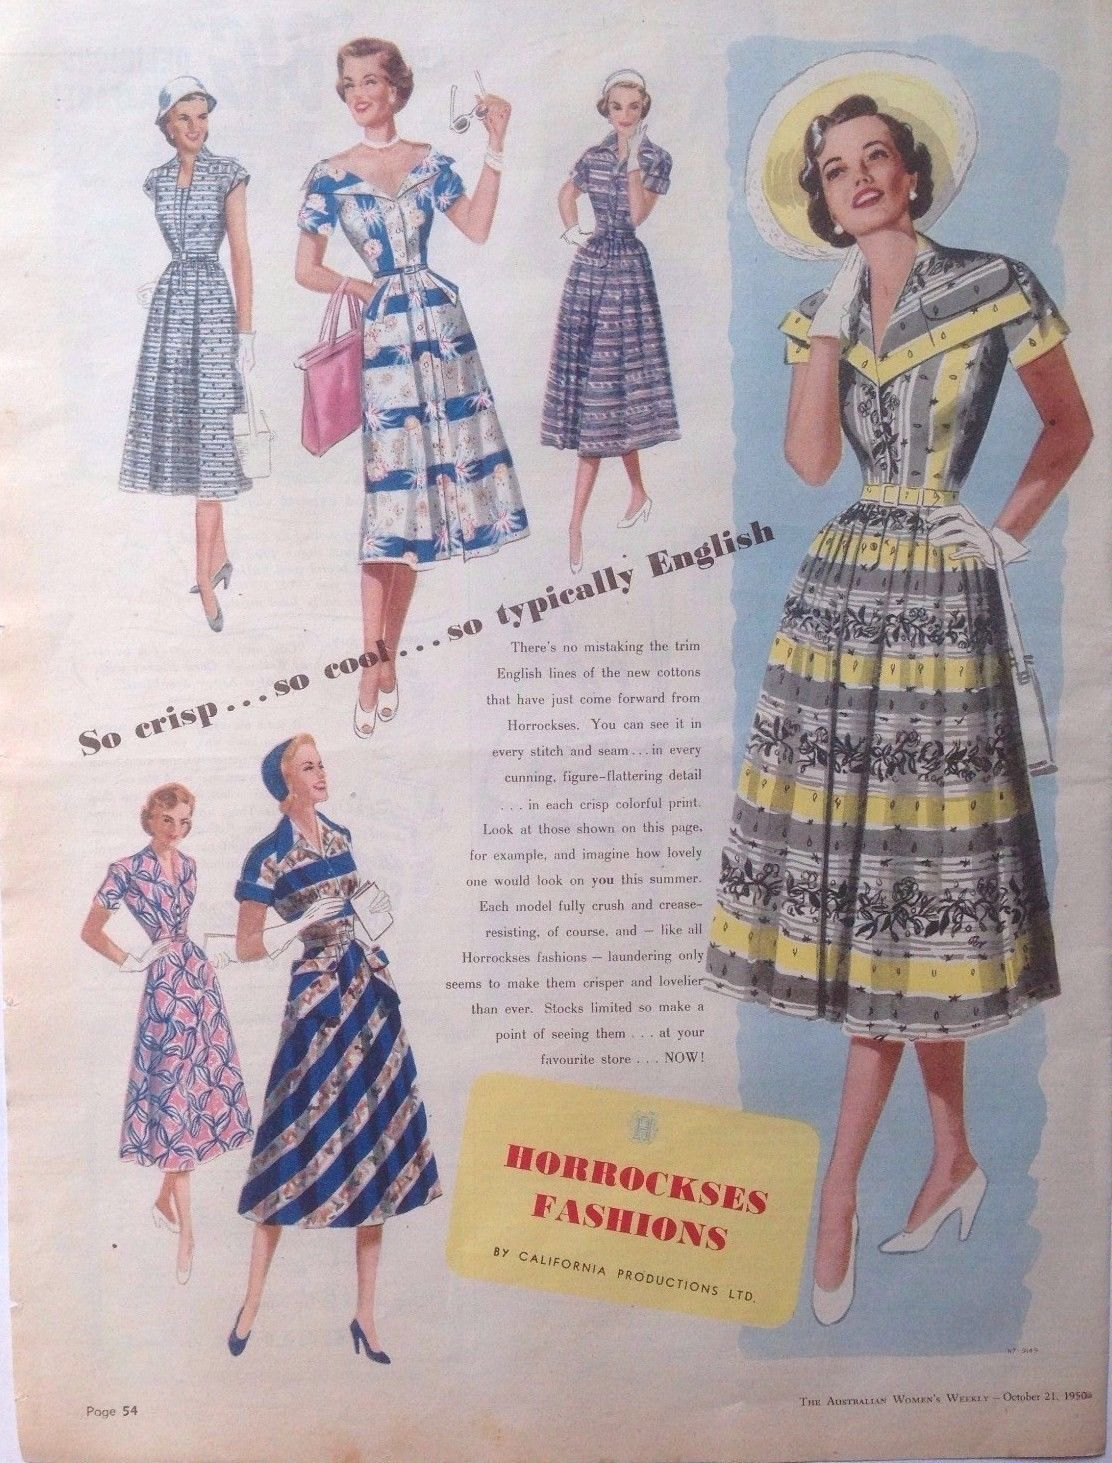 Original HORROCKSES FABRIC AD RETRO DRESS FASHION 1950 vintage AUSTRALIAN advert…